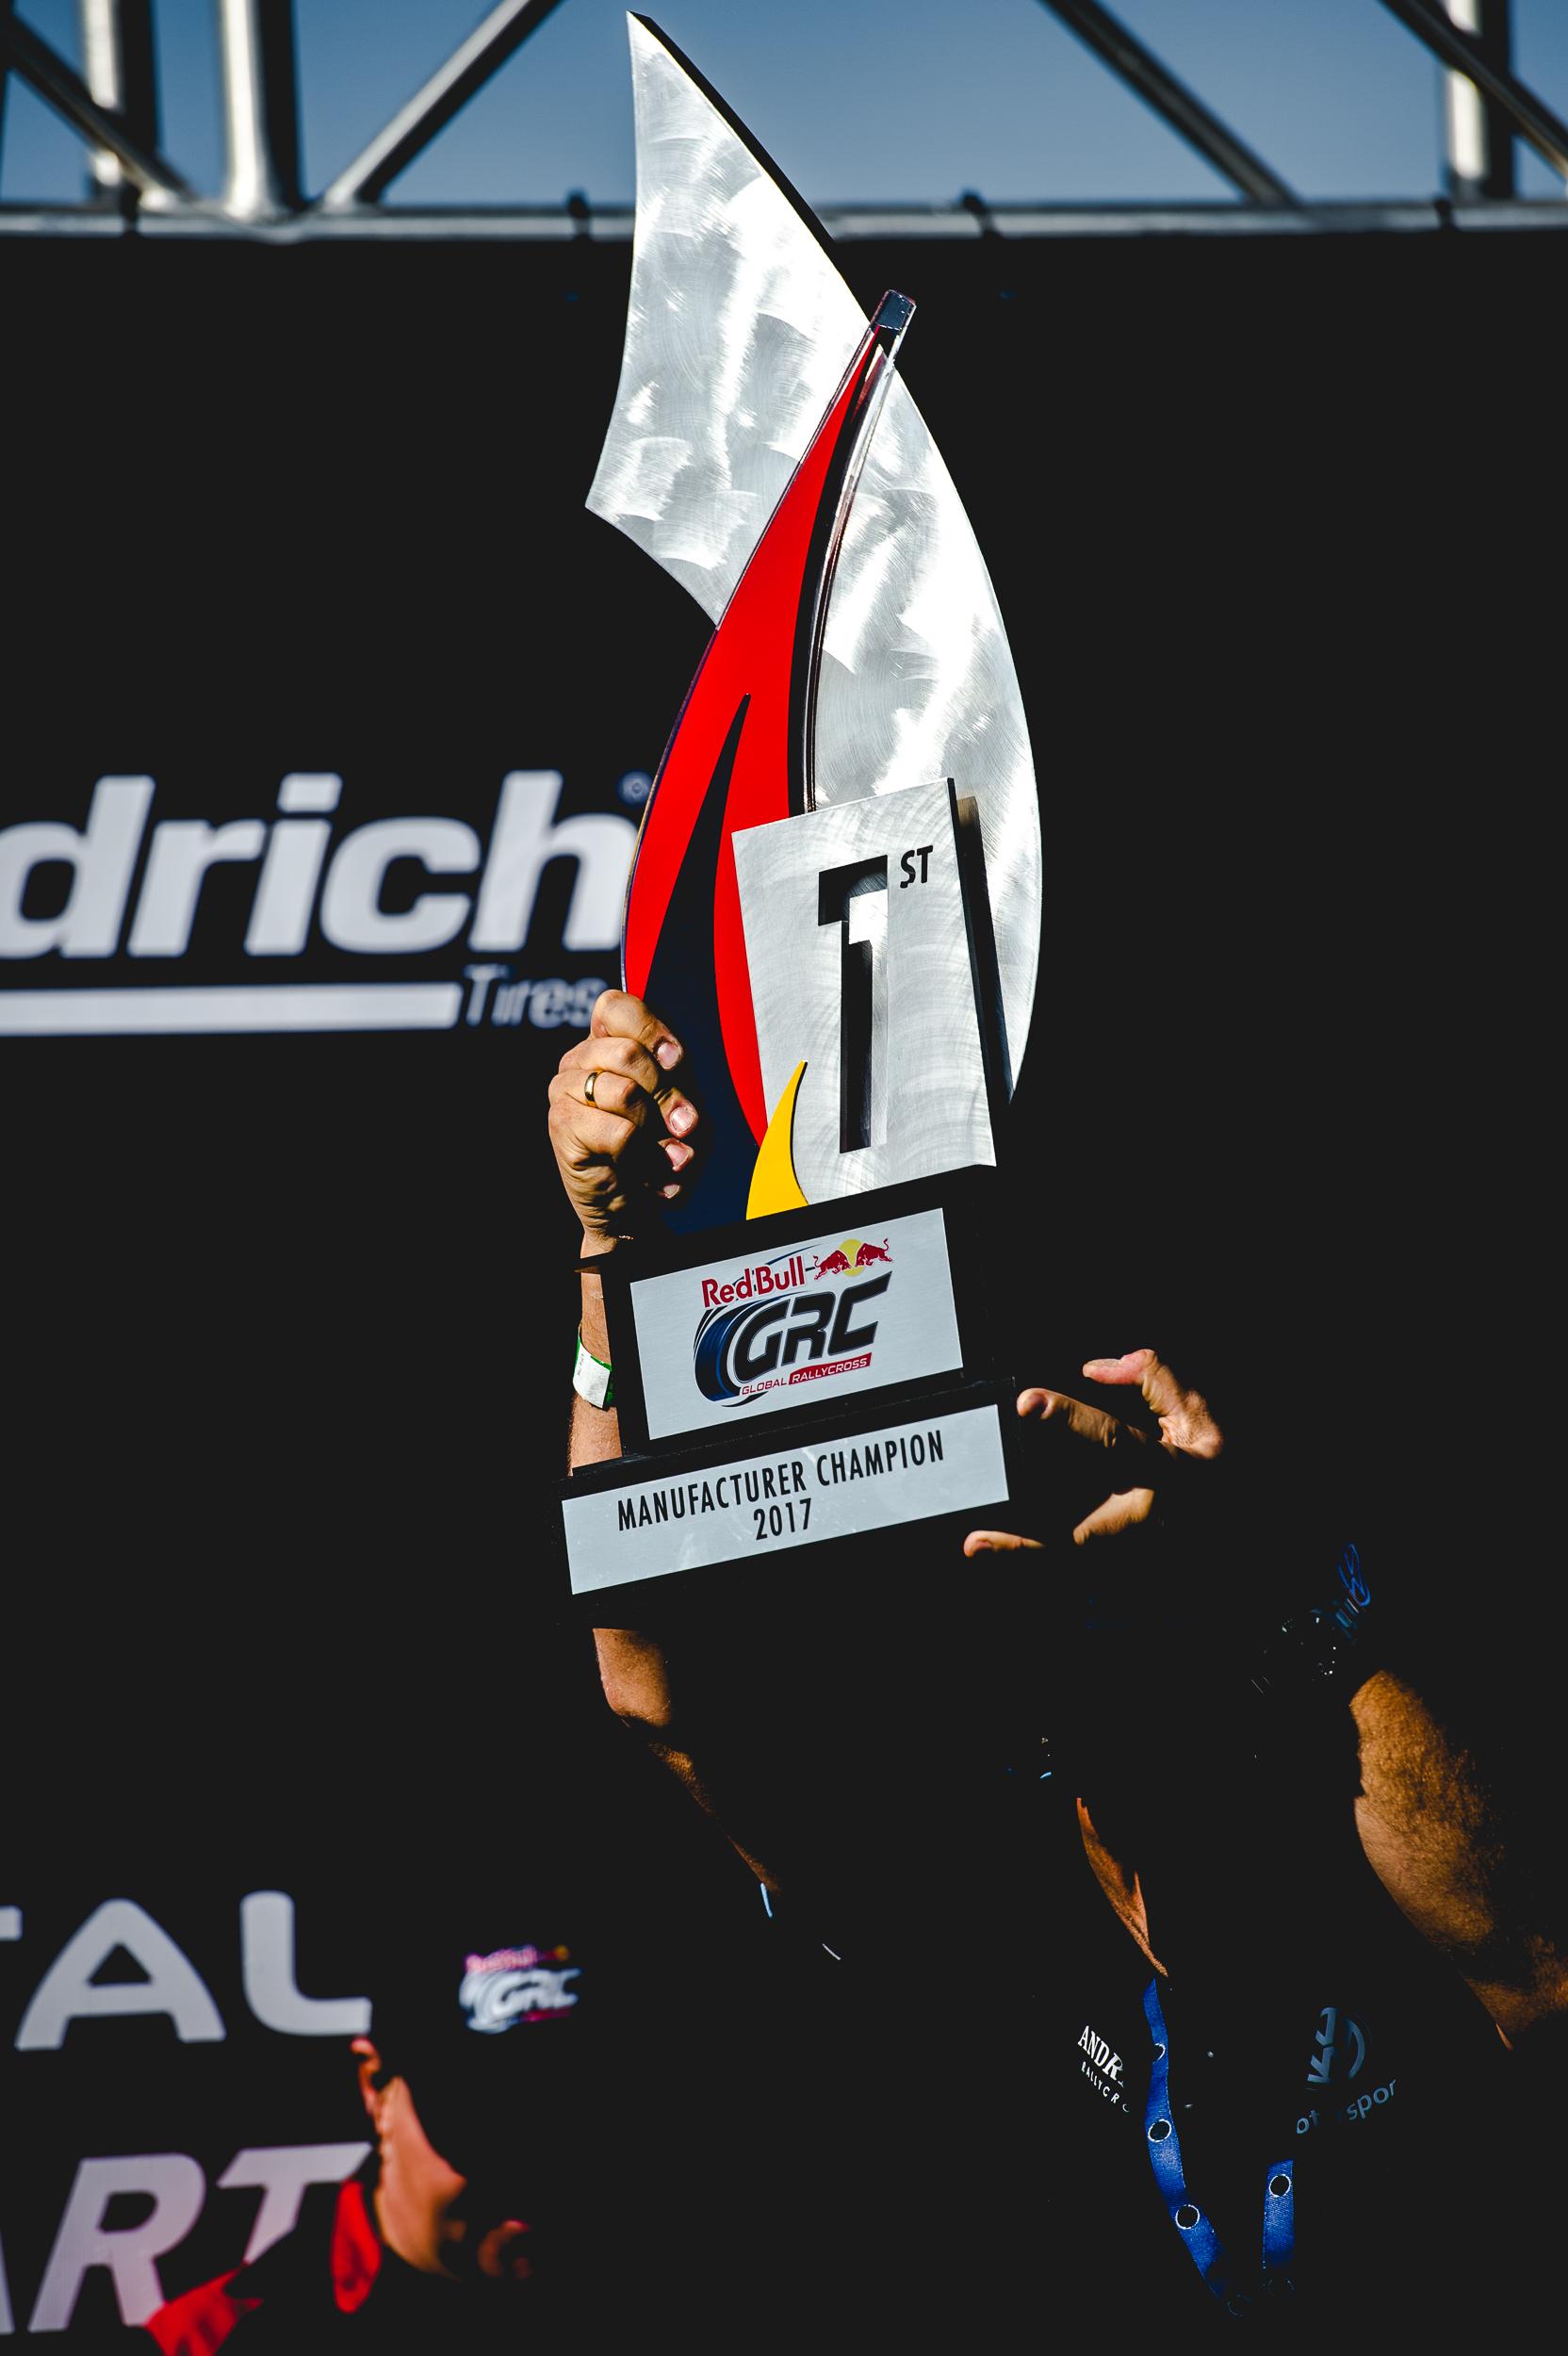 2017 Red Bull GRC Supercar Division Manufacturer Champion:  Volkswagen Andretti Rallycross